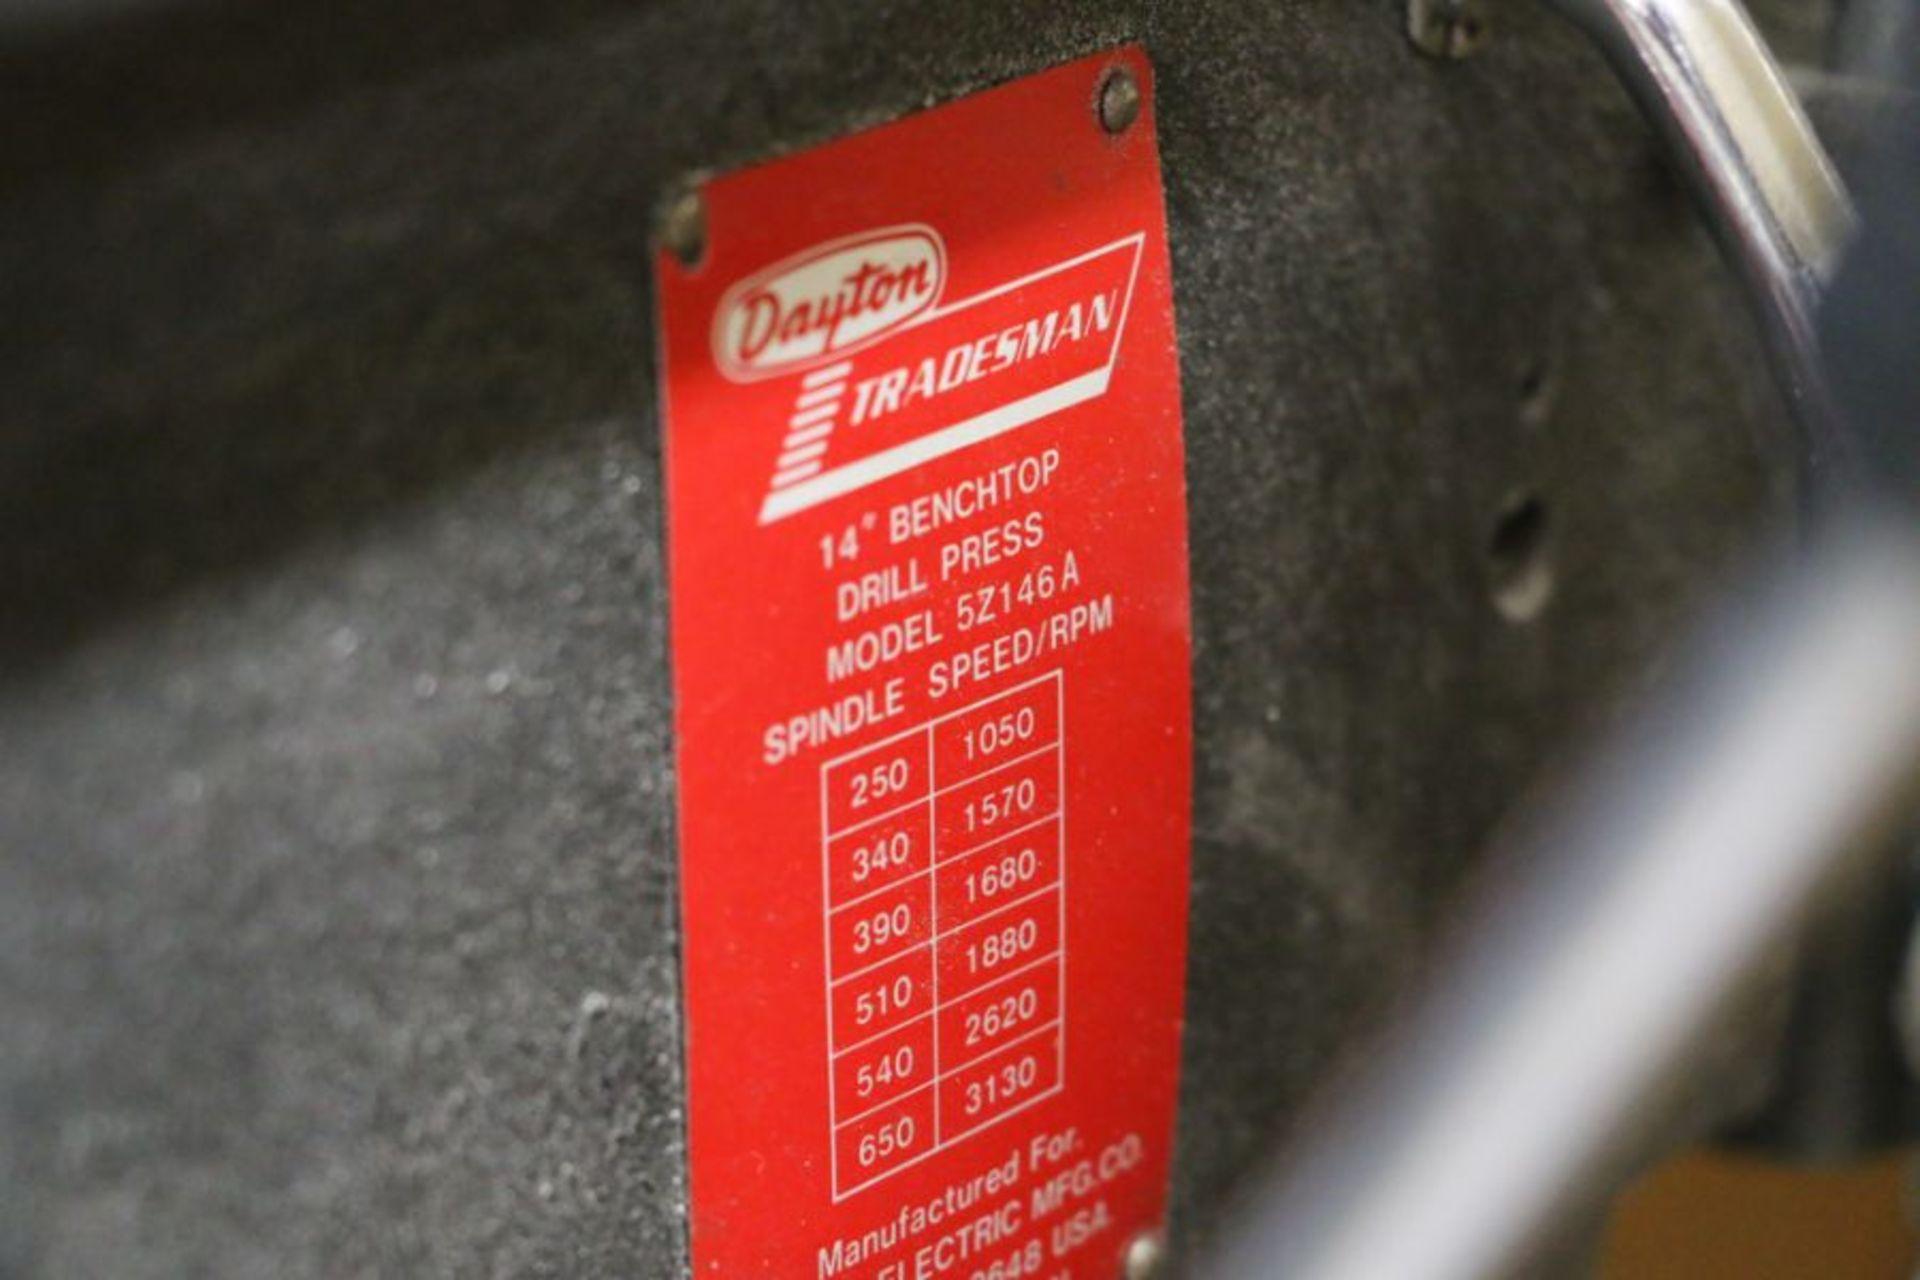 "Dayton 14"" Bench Top Drill Press - Image 4 of 4"